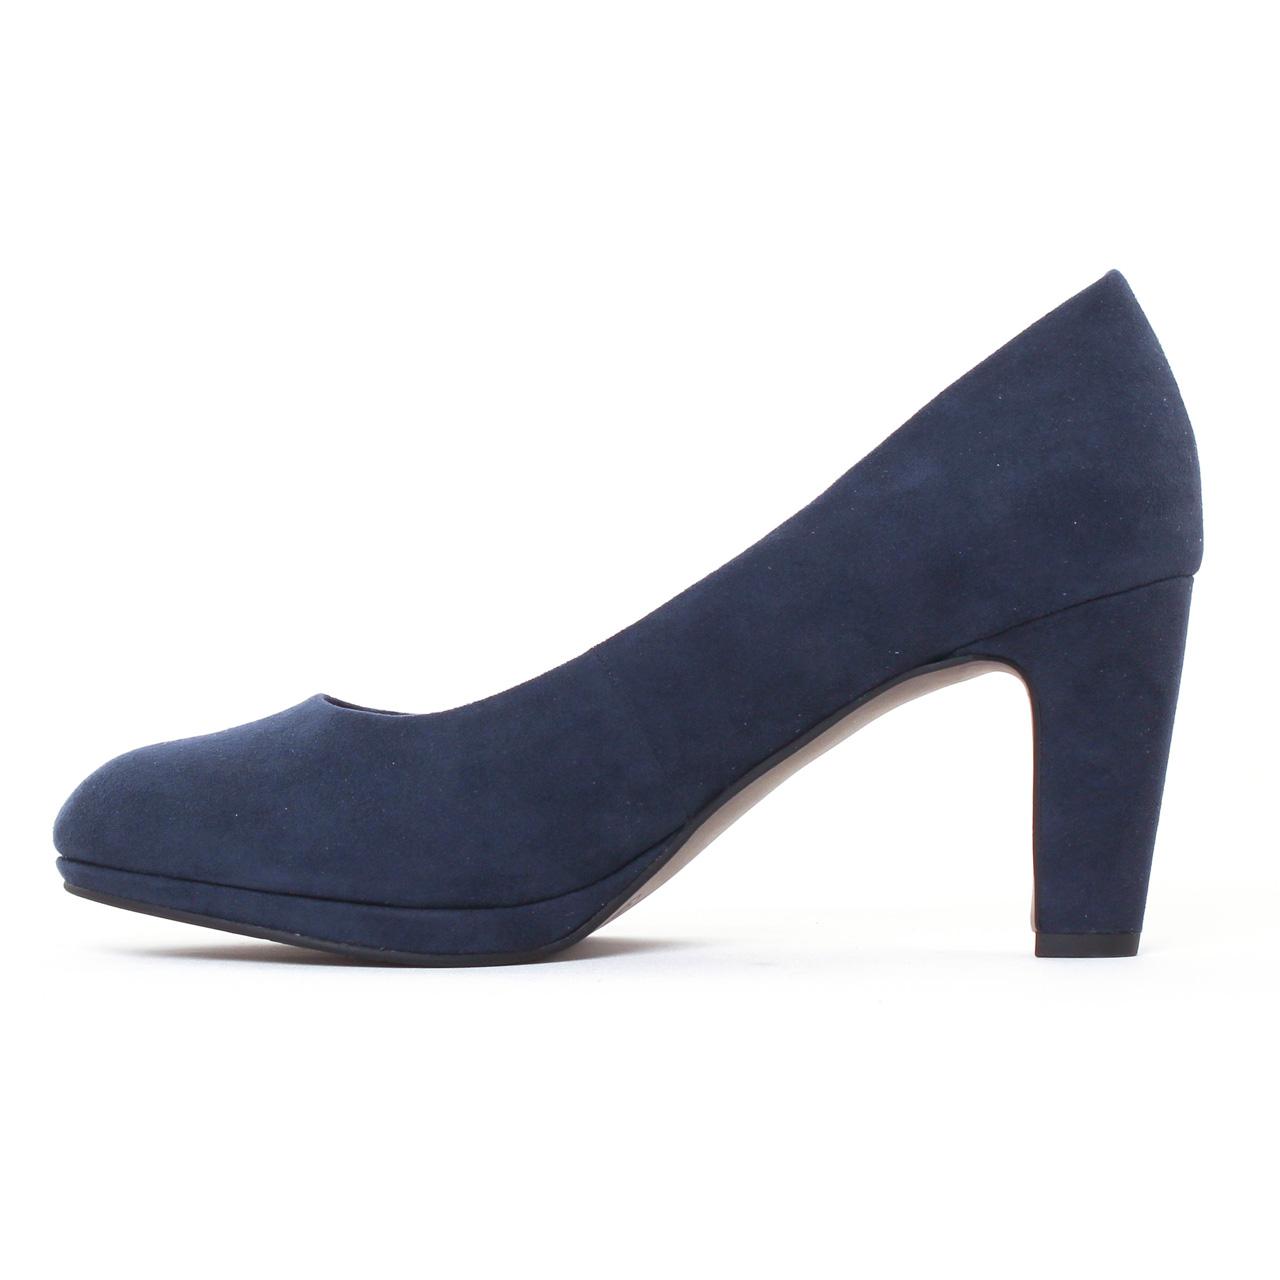 22420, Escarpins Femme, Bleu (Navy), 37 EUTamaris